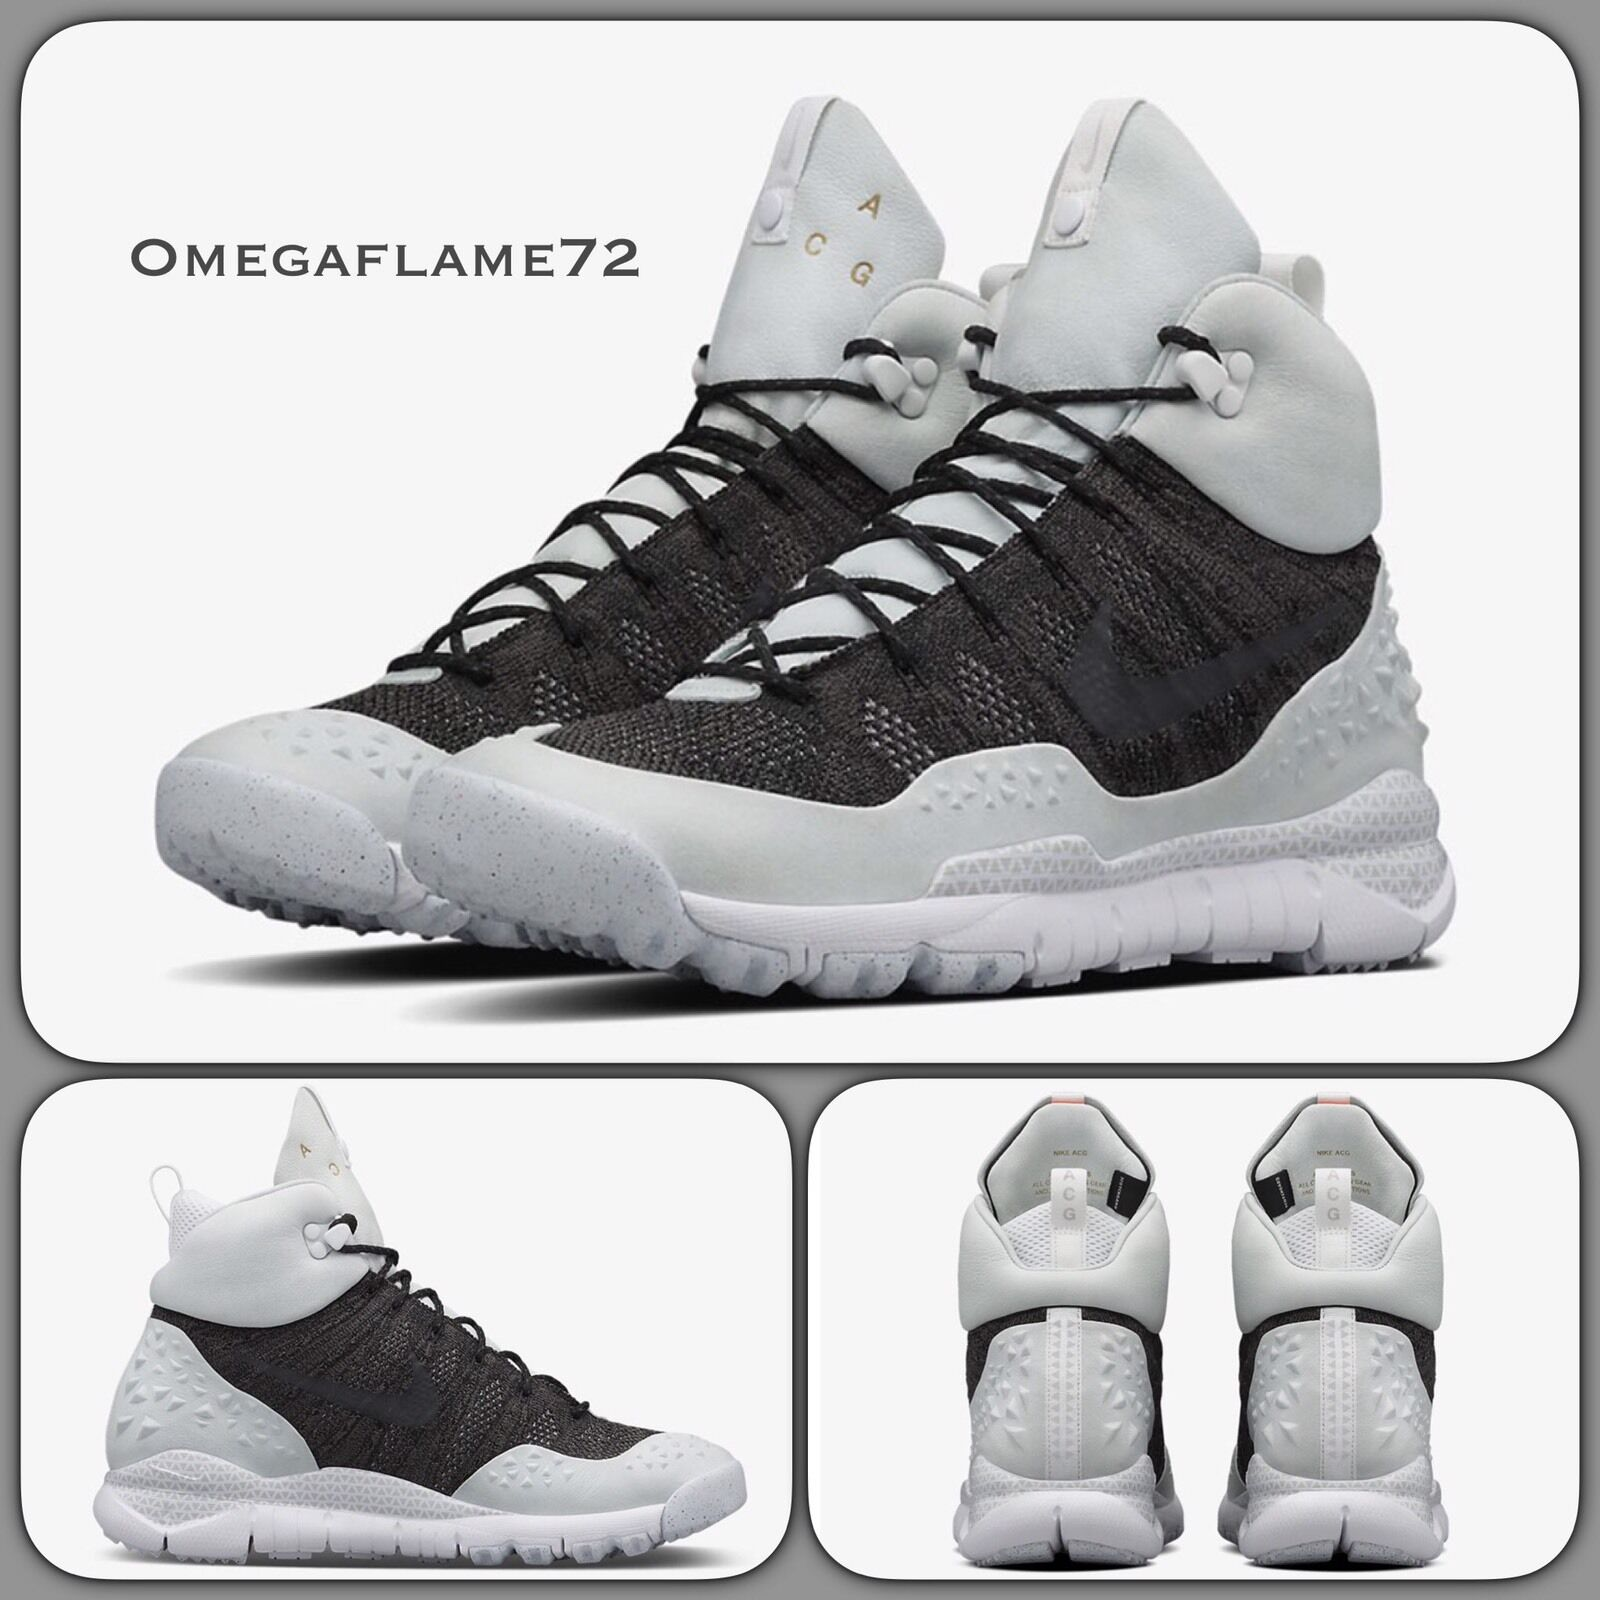 Nike Lupinek Flyknit ACG 5 826077-0024.5 EUR 37.5 USA 5 ACG Noir White be87d9